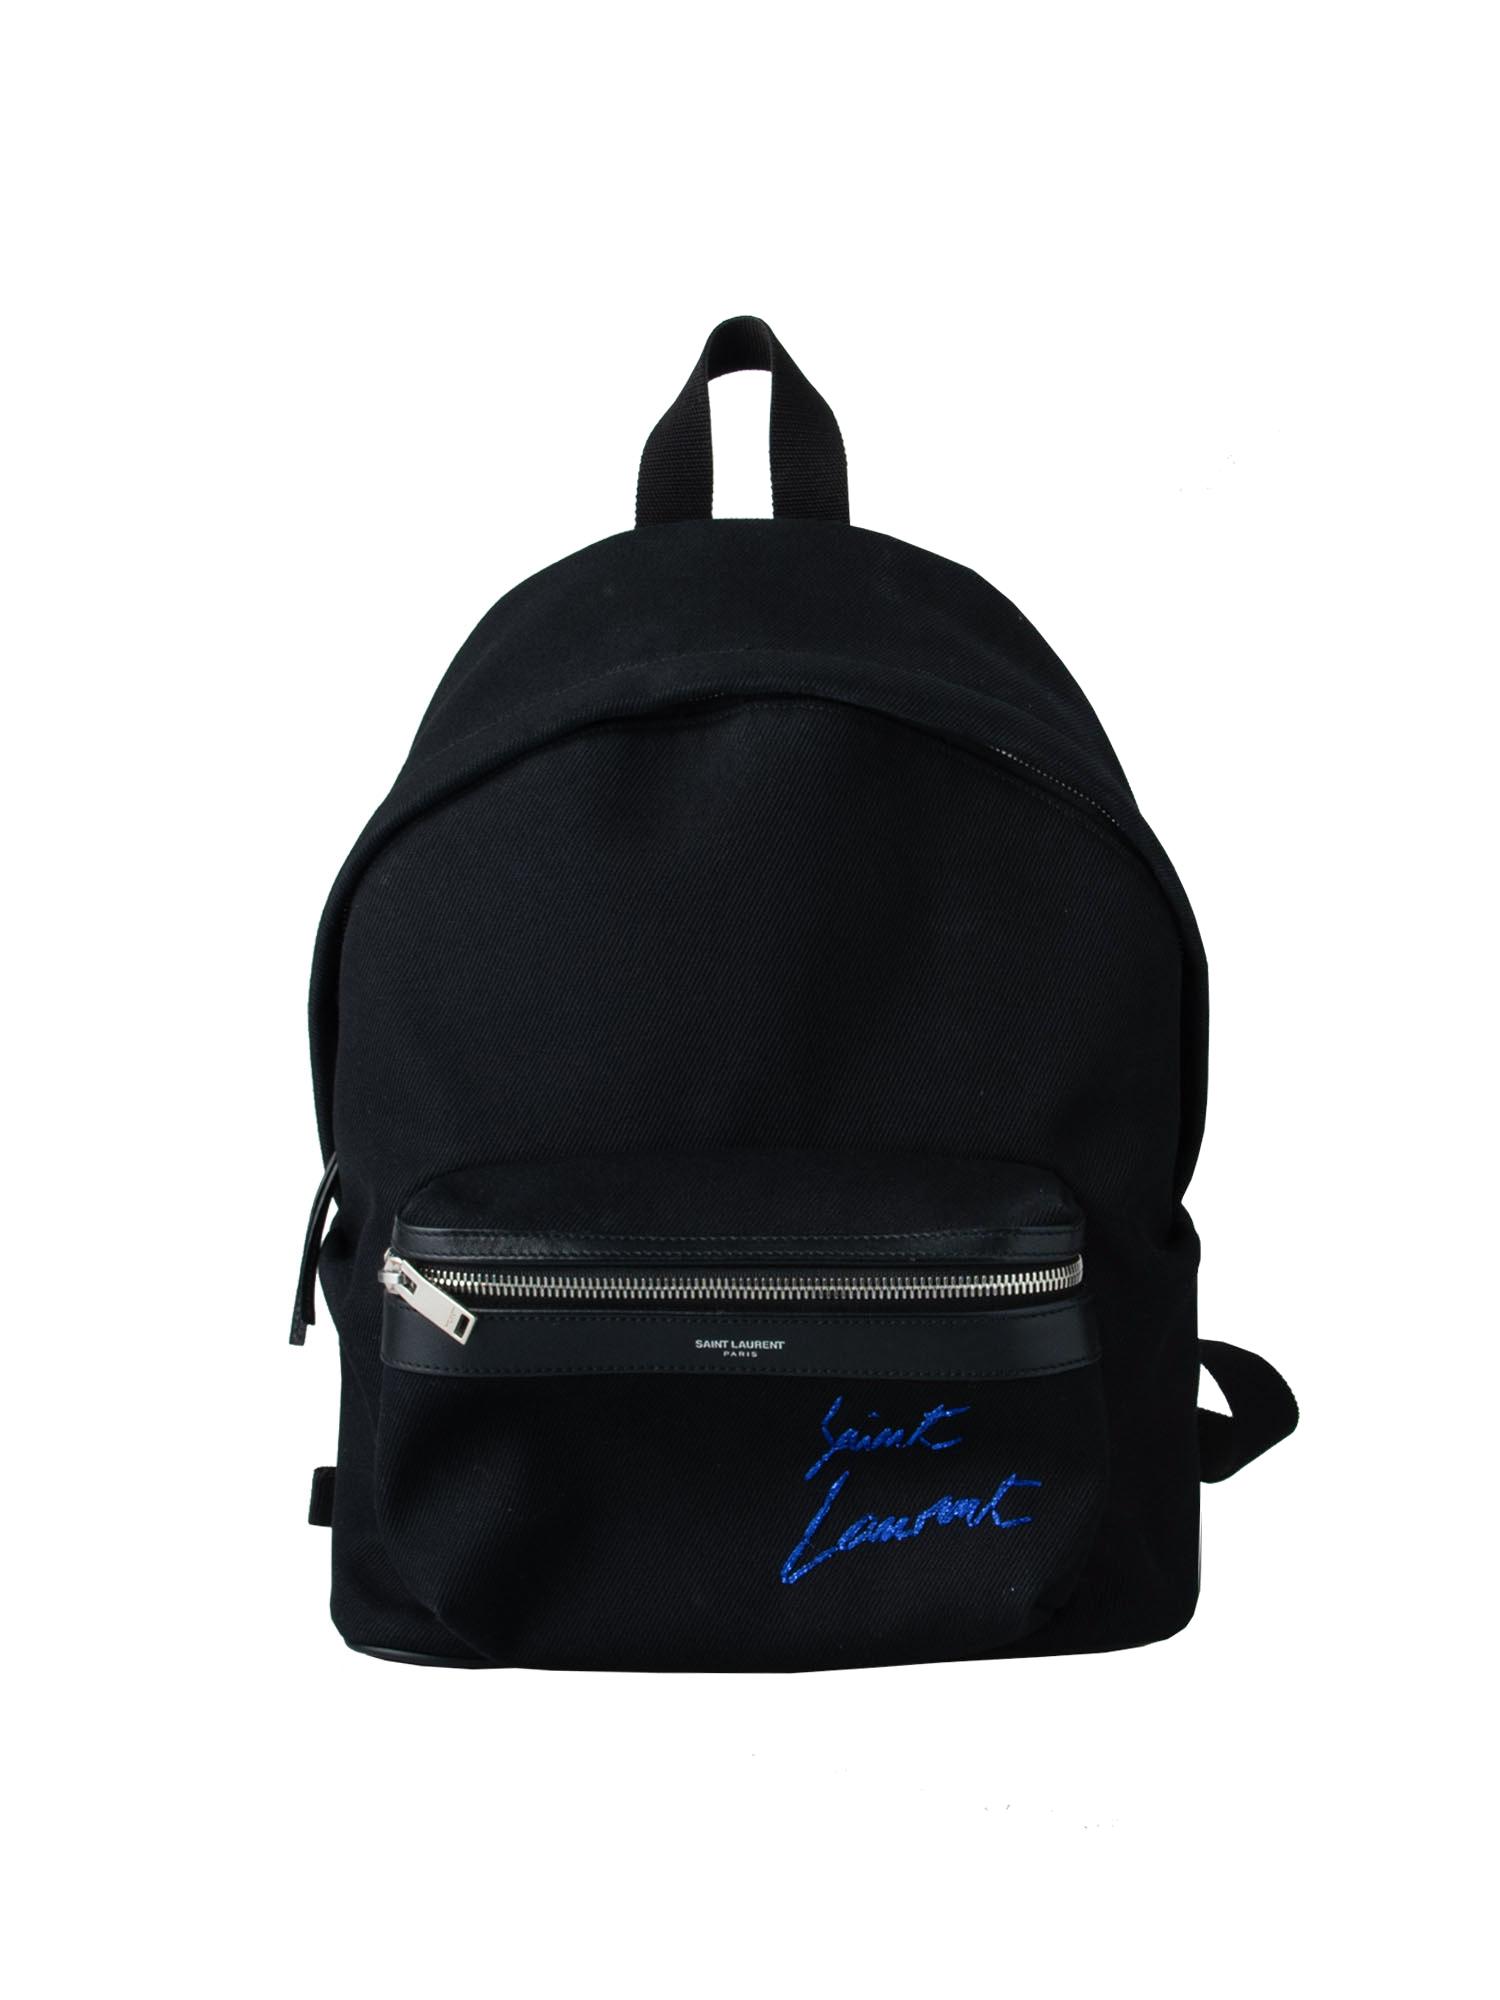 Stark M Studs Backpack in Visetos (4)Artboard 1